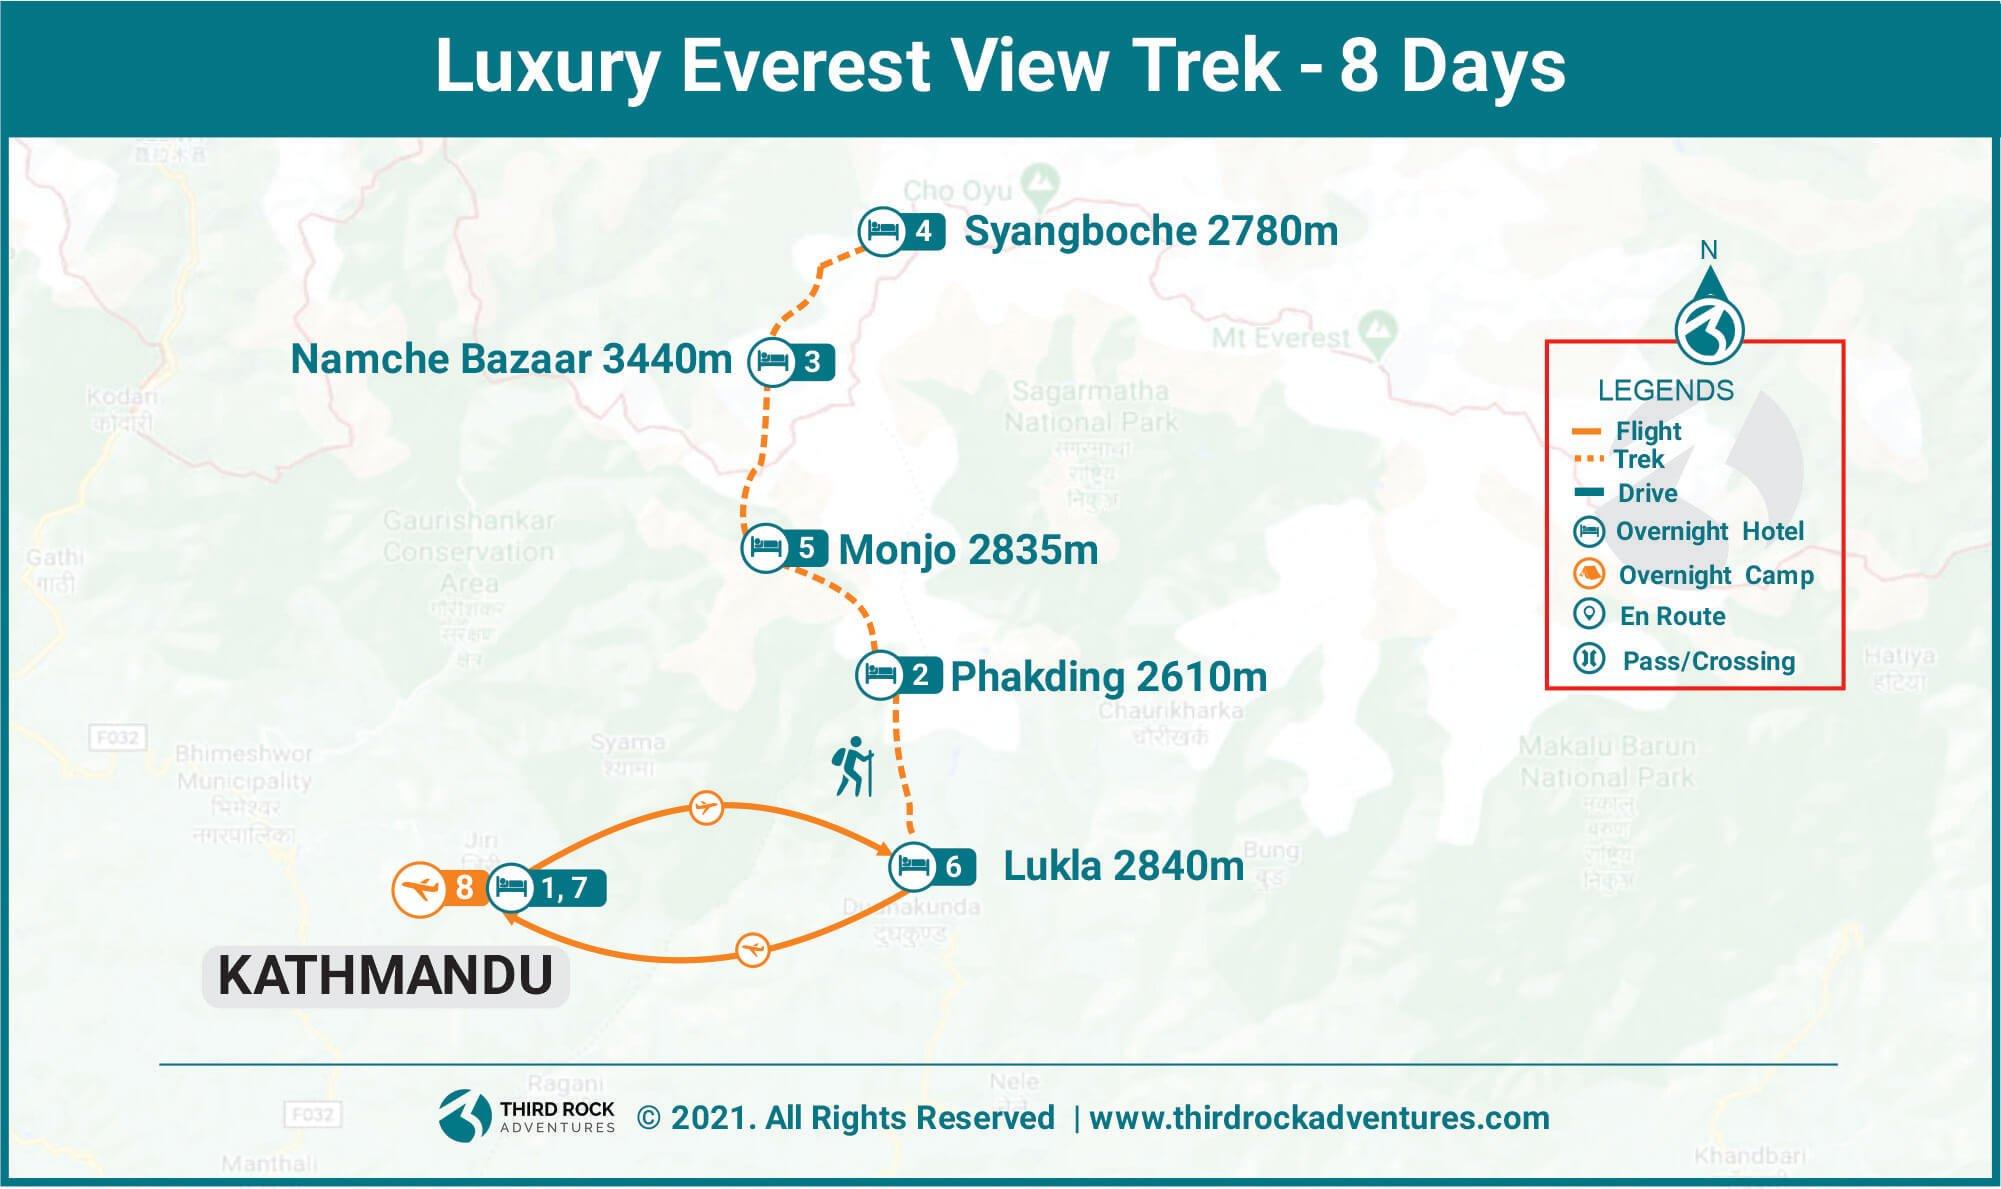 Luxury Everest View Trek Route Map